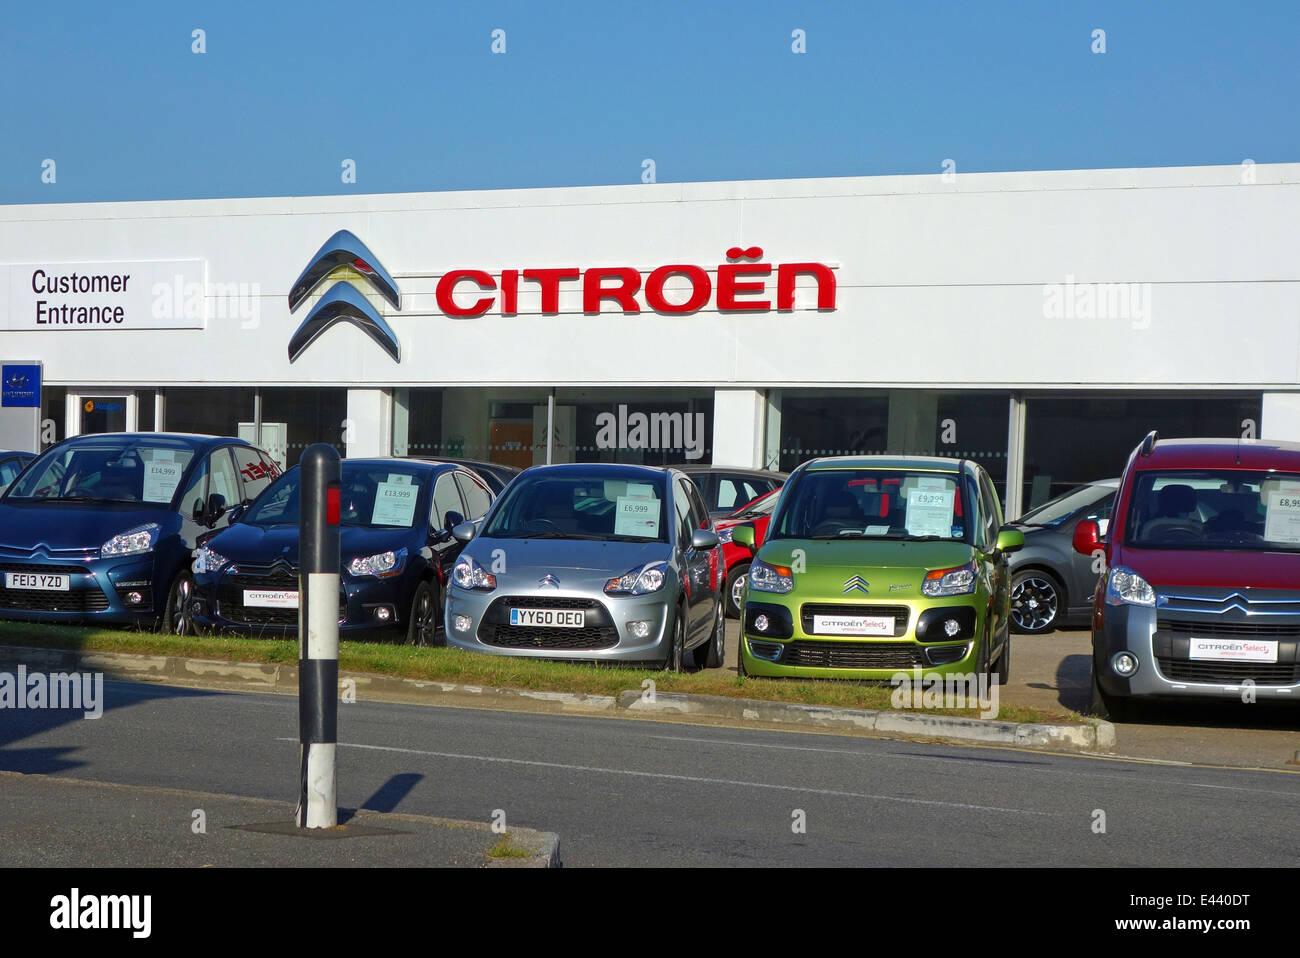 Garage Citroen Stock Photos Garage Citroen Stock Images Alamy